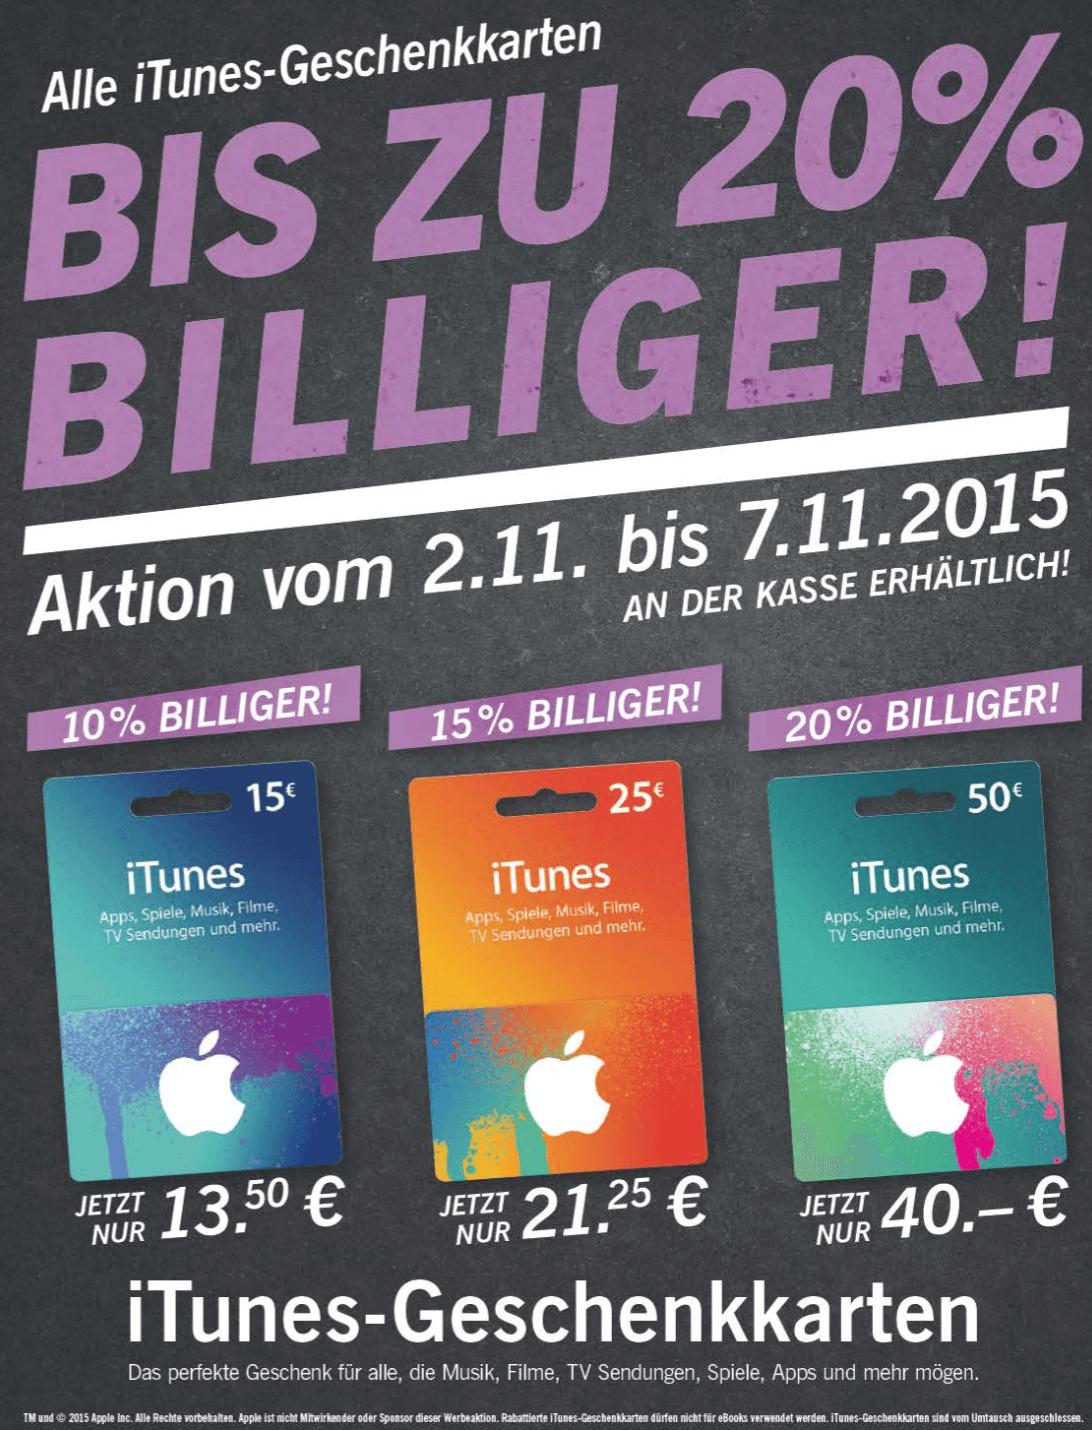 Rabatt auf iTunes-Guthabenkarten bei Lidl (Screenshot aus Lidl-Prospekt)